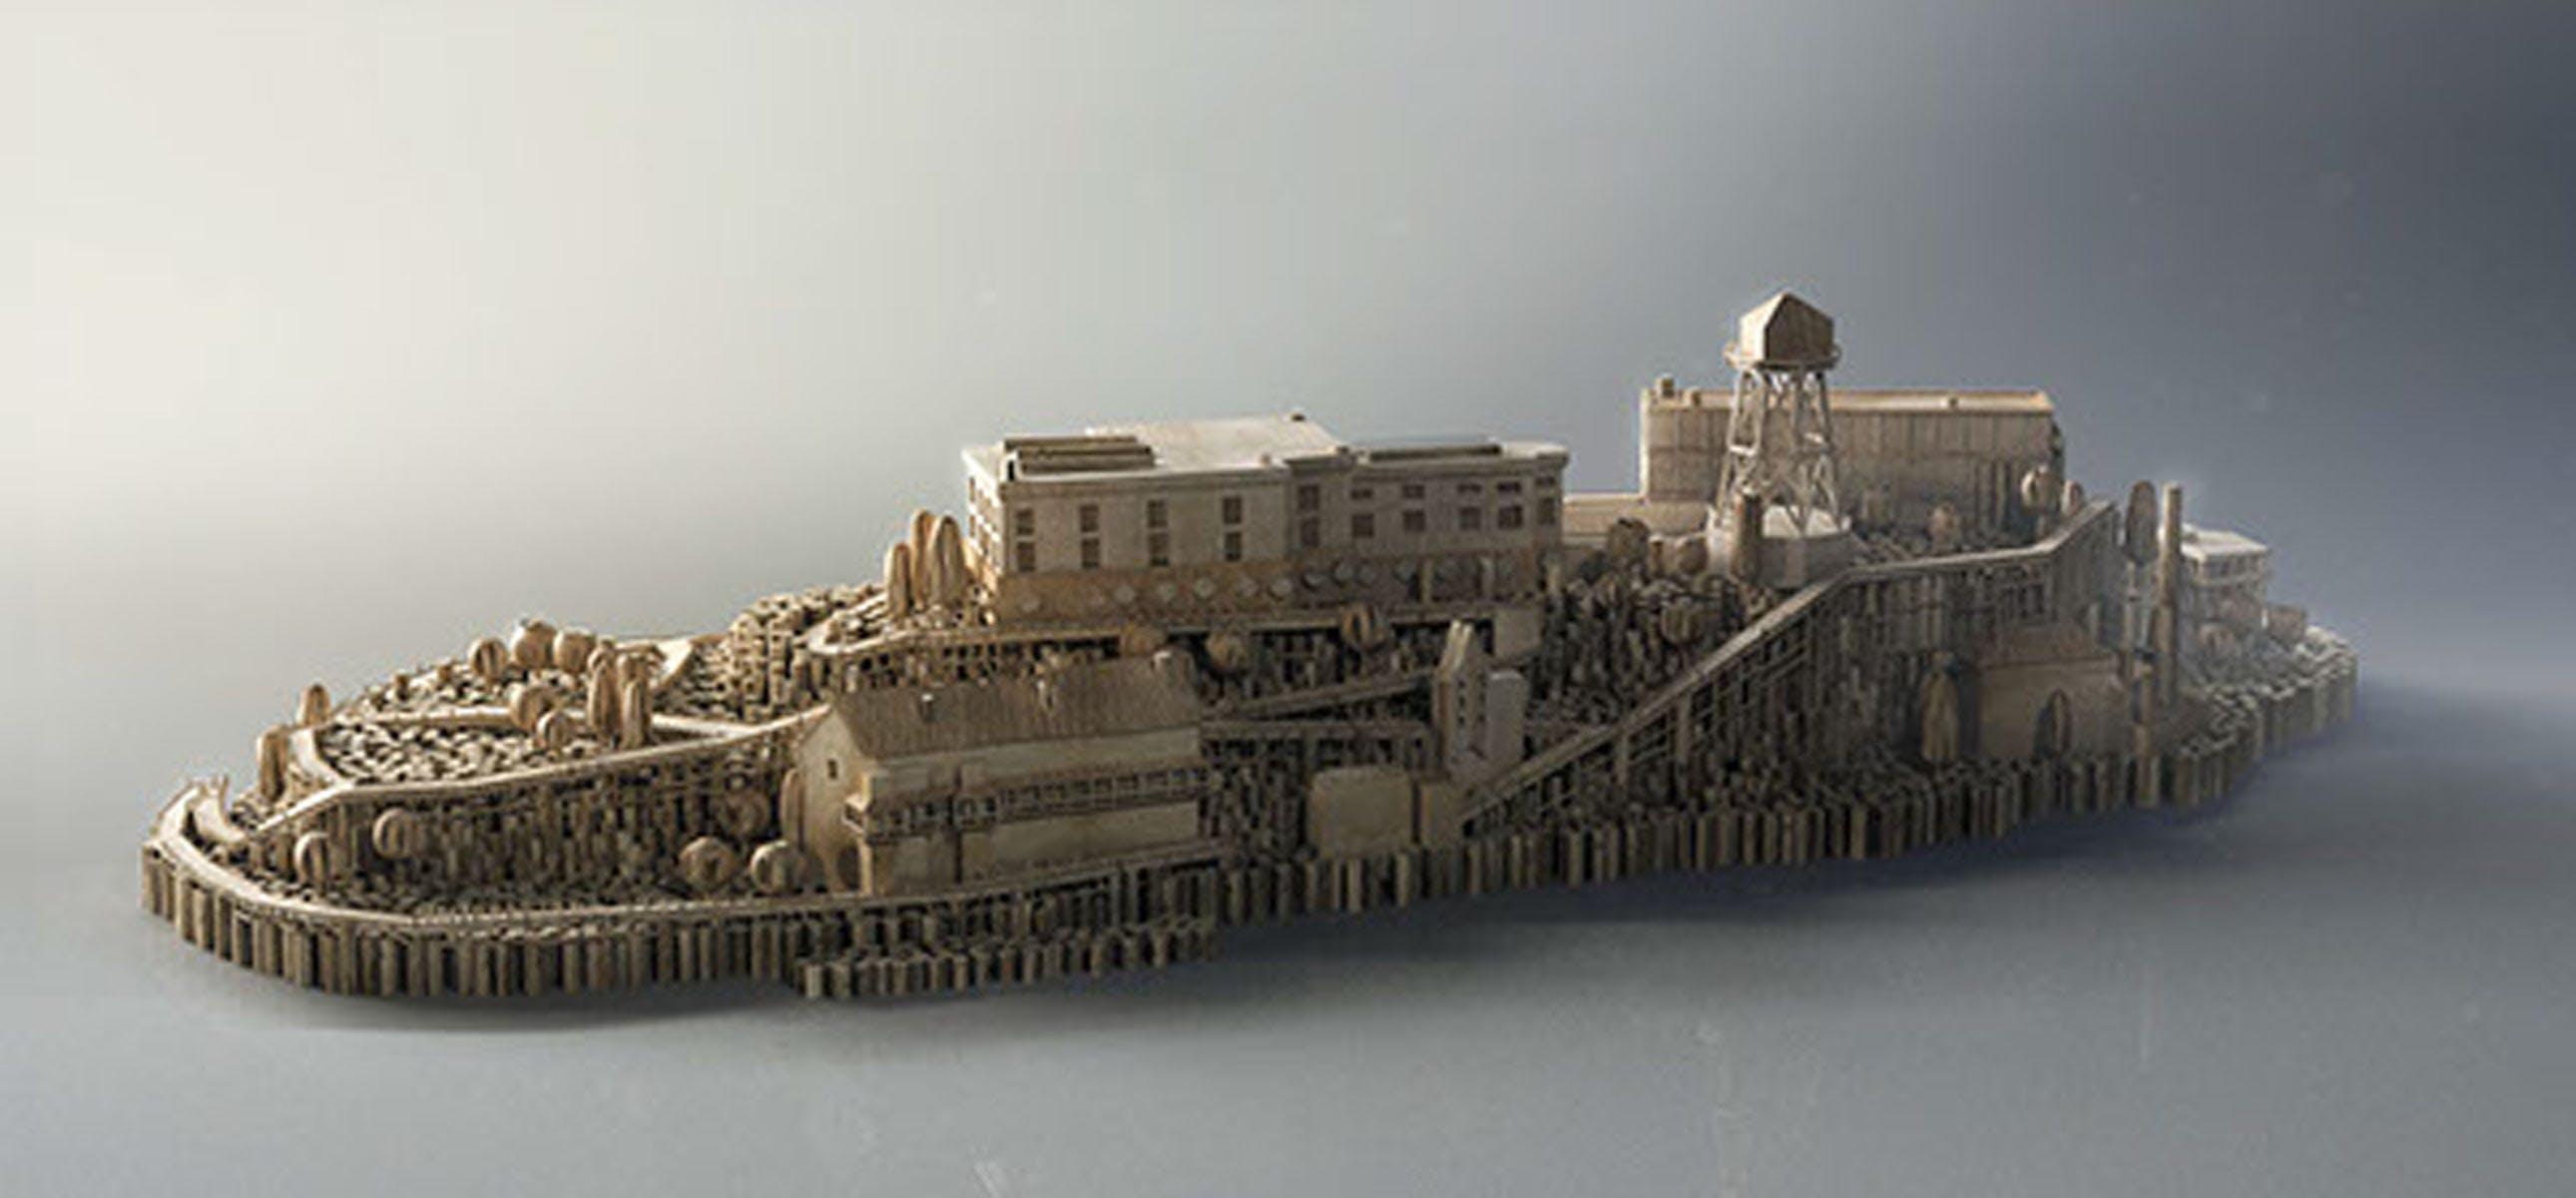 Free stock photo of wood city